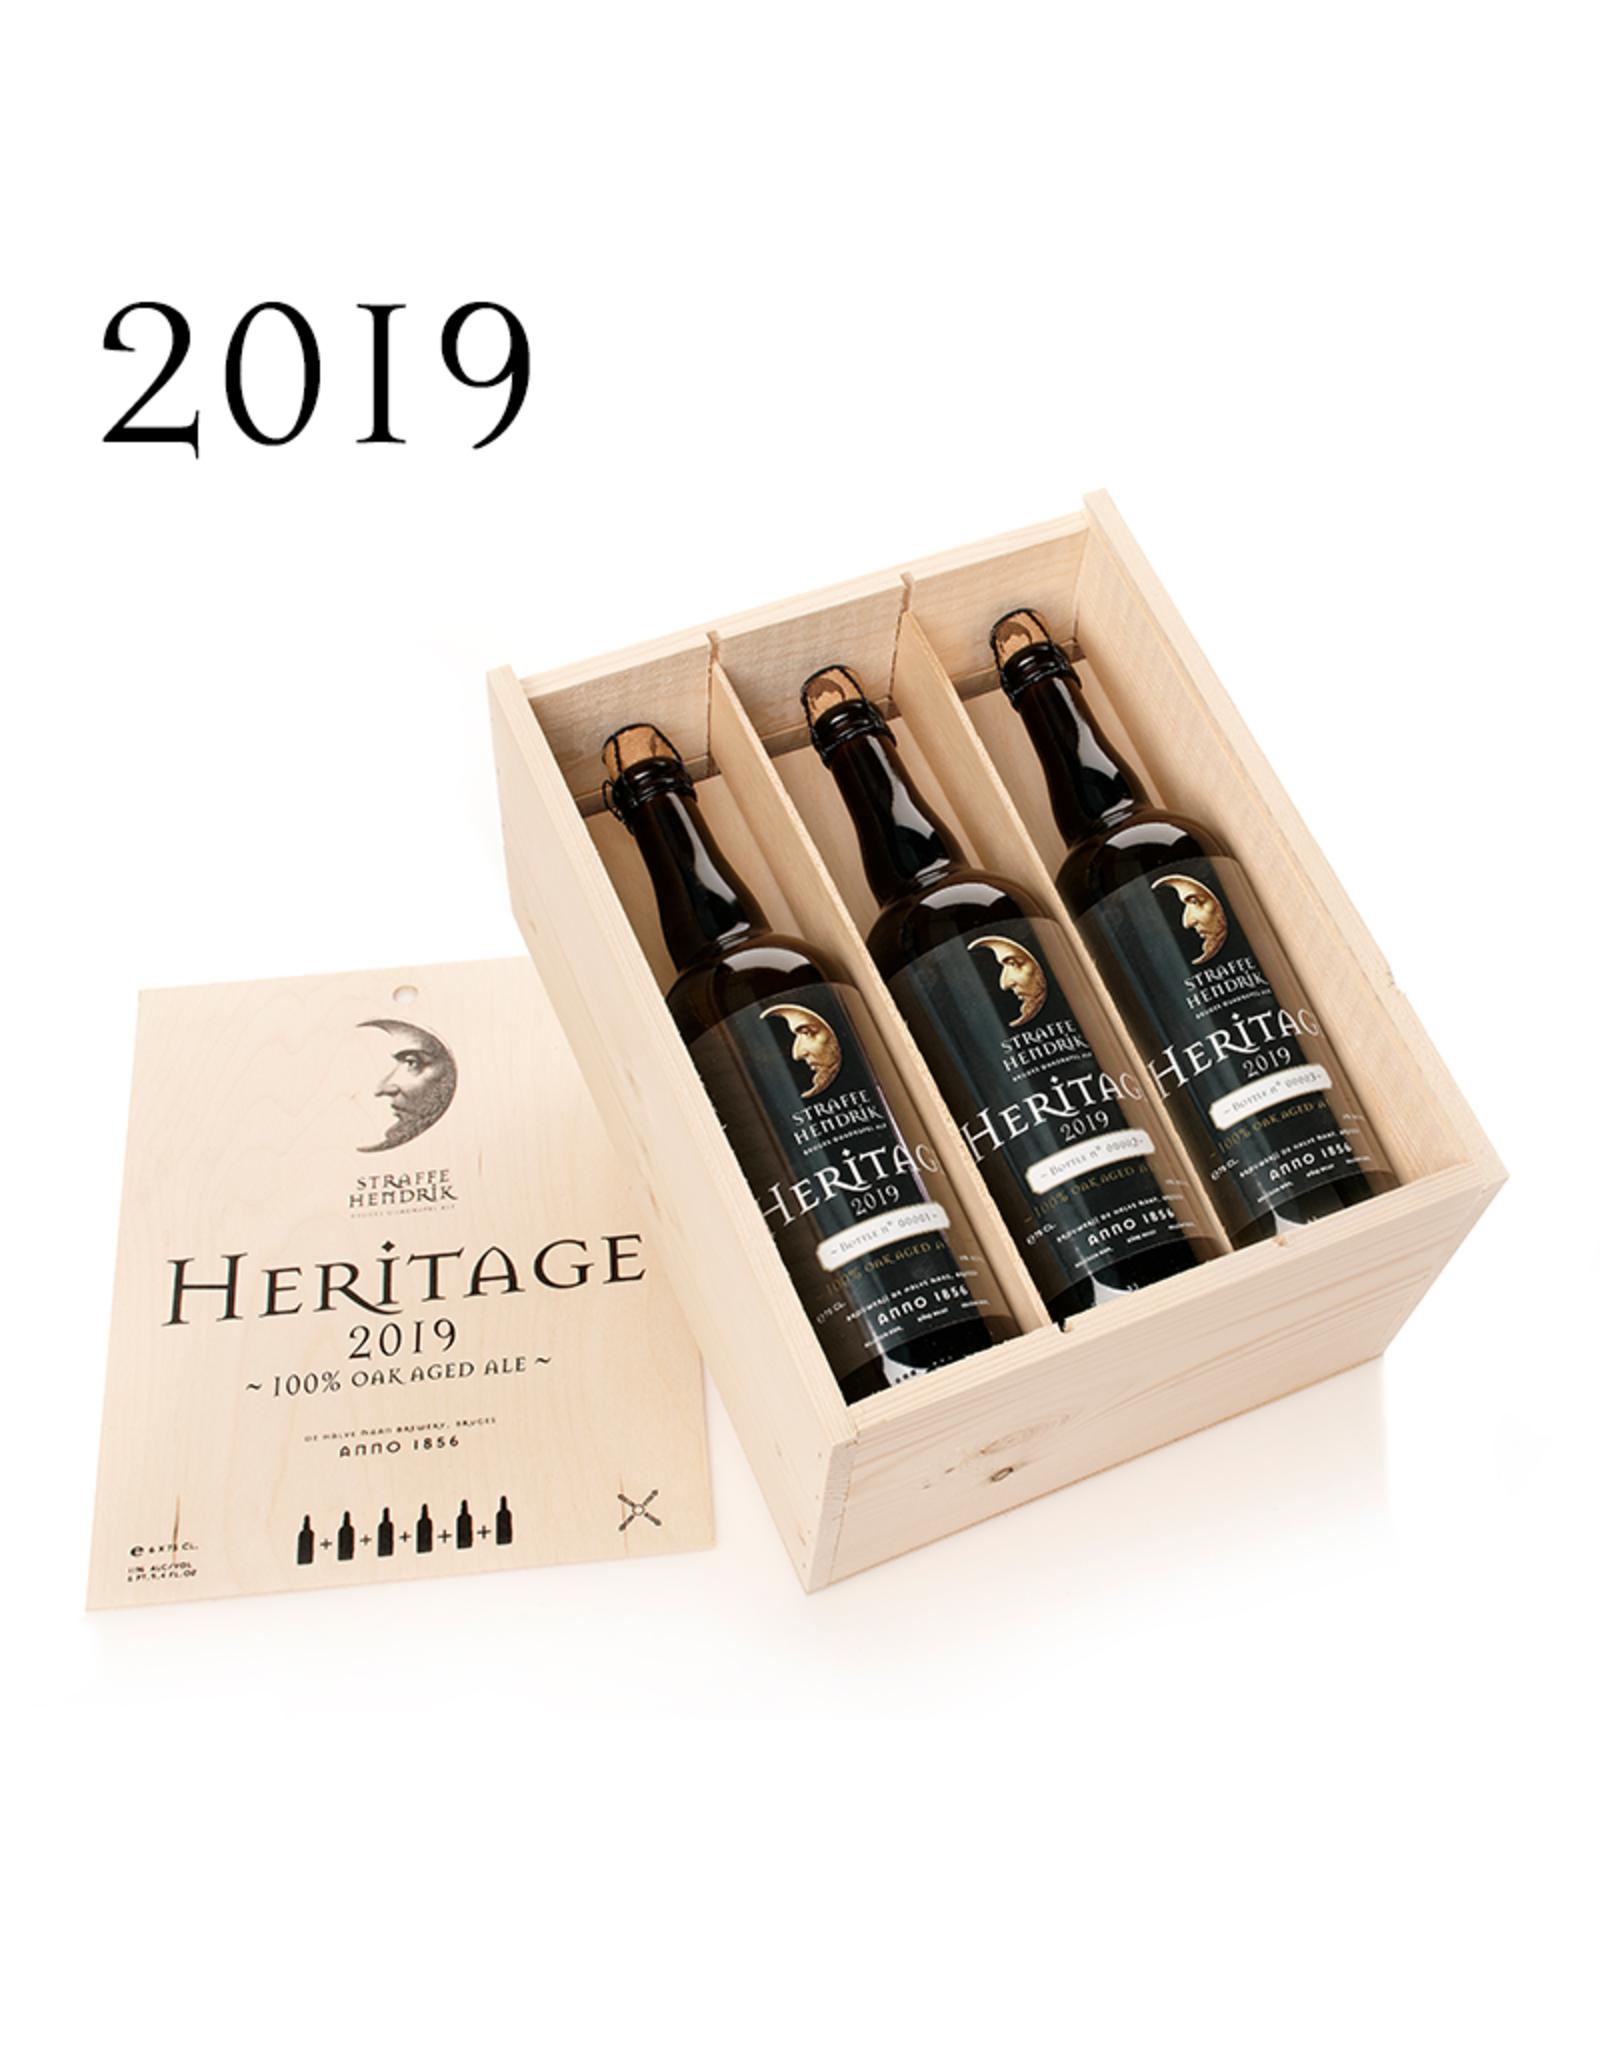 Straffe Hendrik Heritage 2019 6 x 75 cl